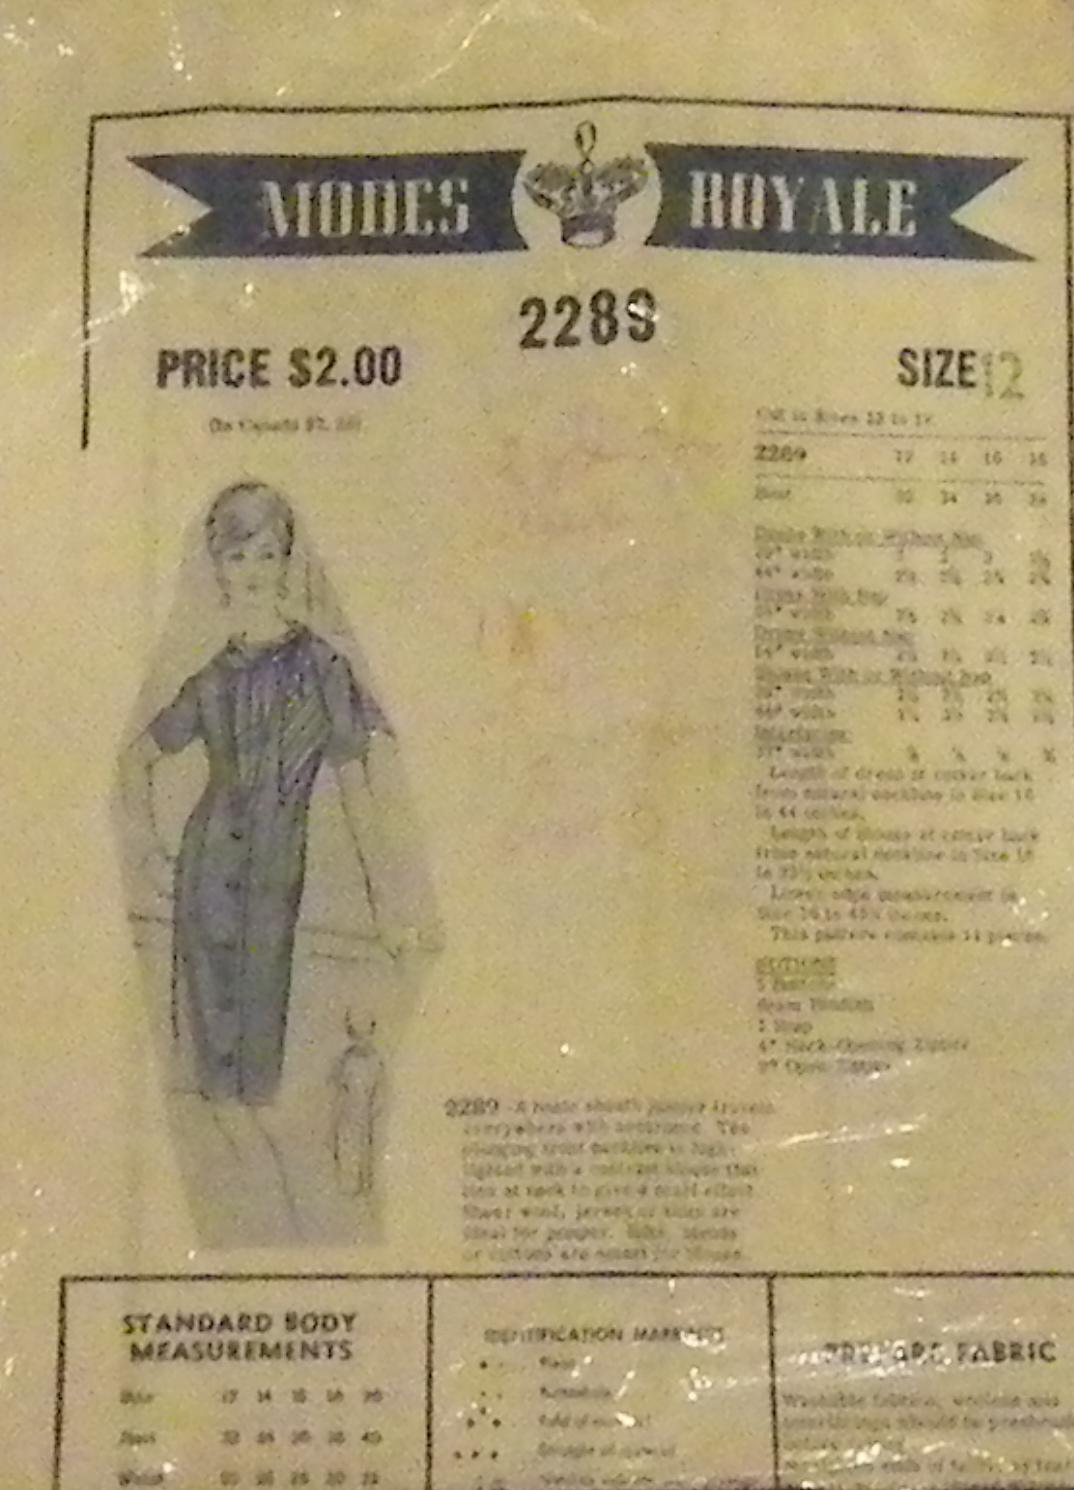 Modes Royale 2289